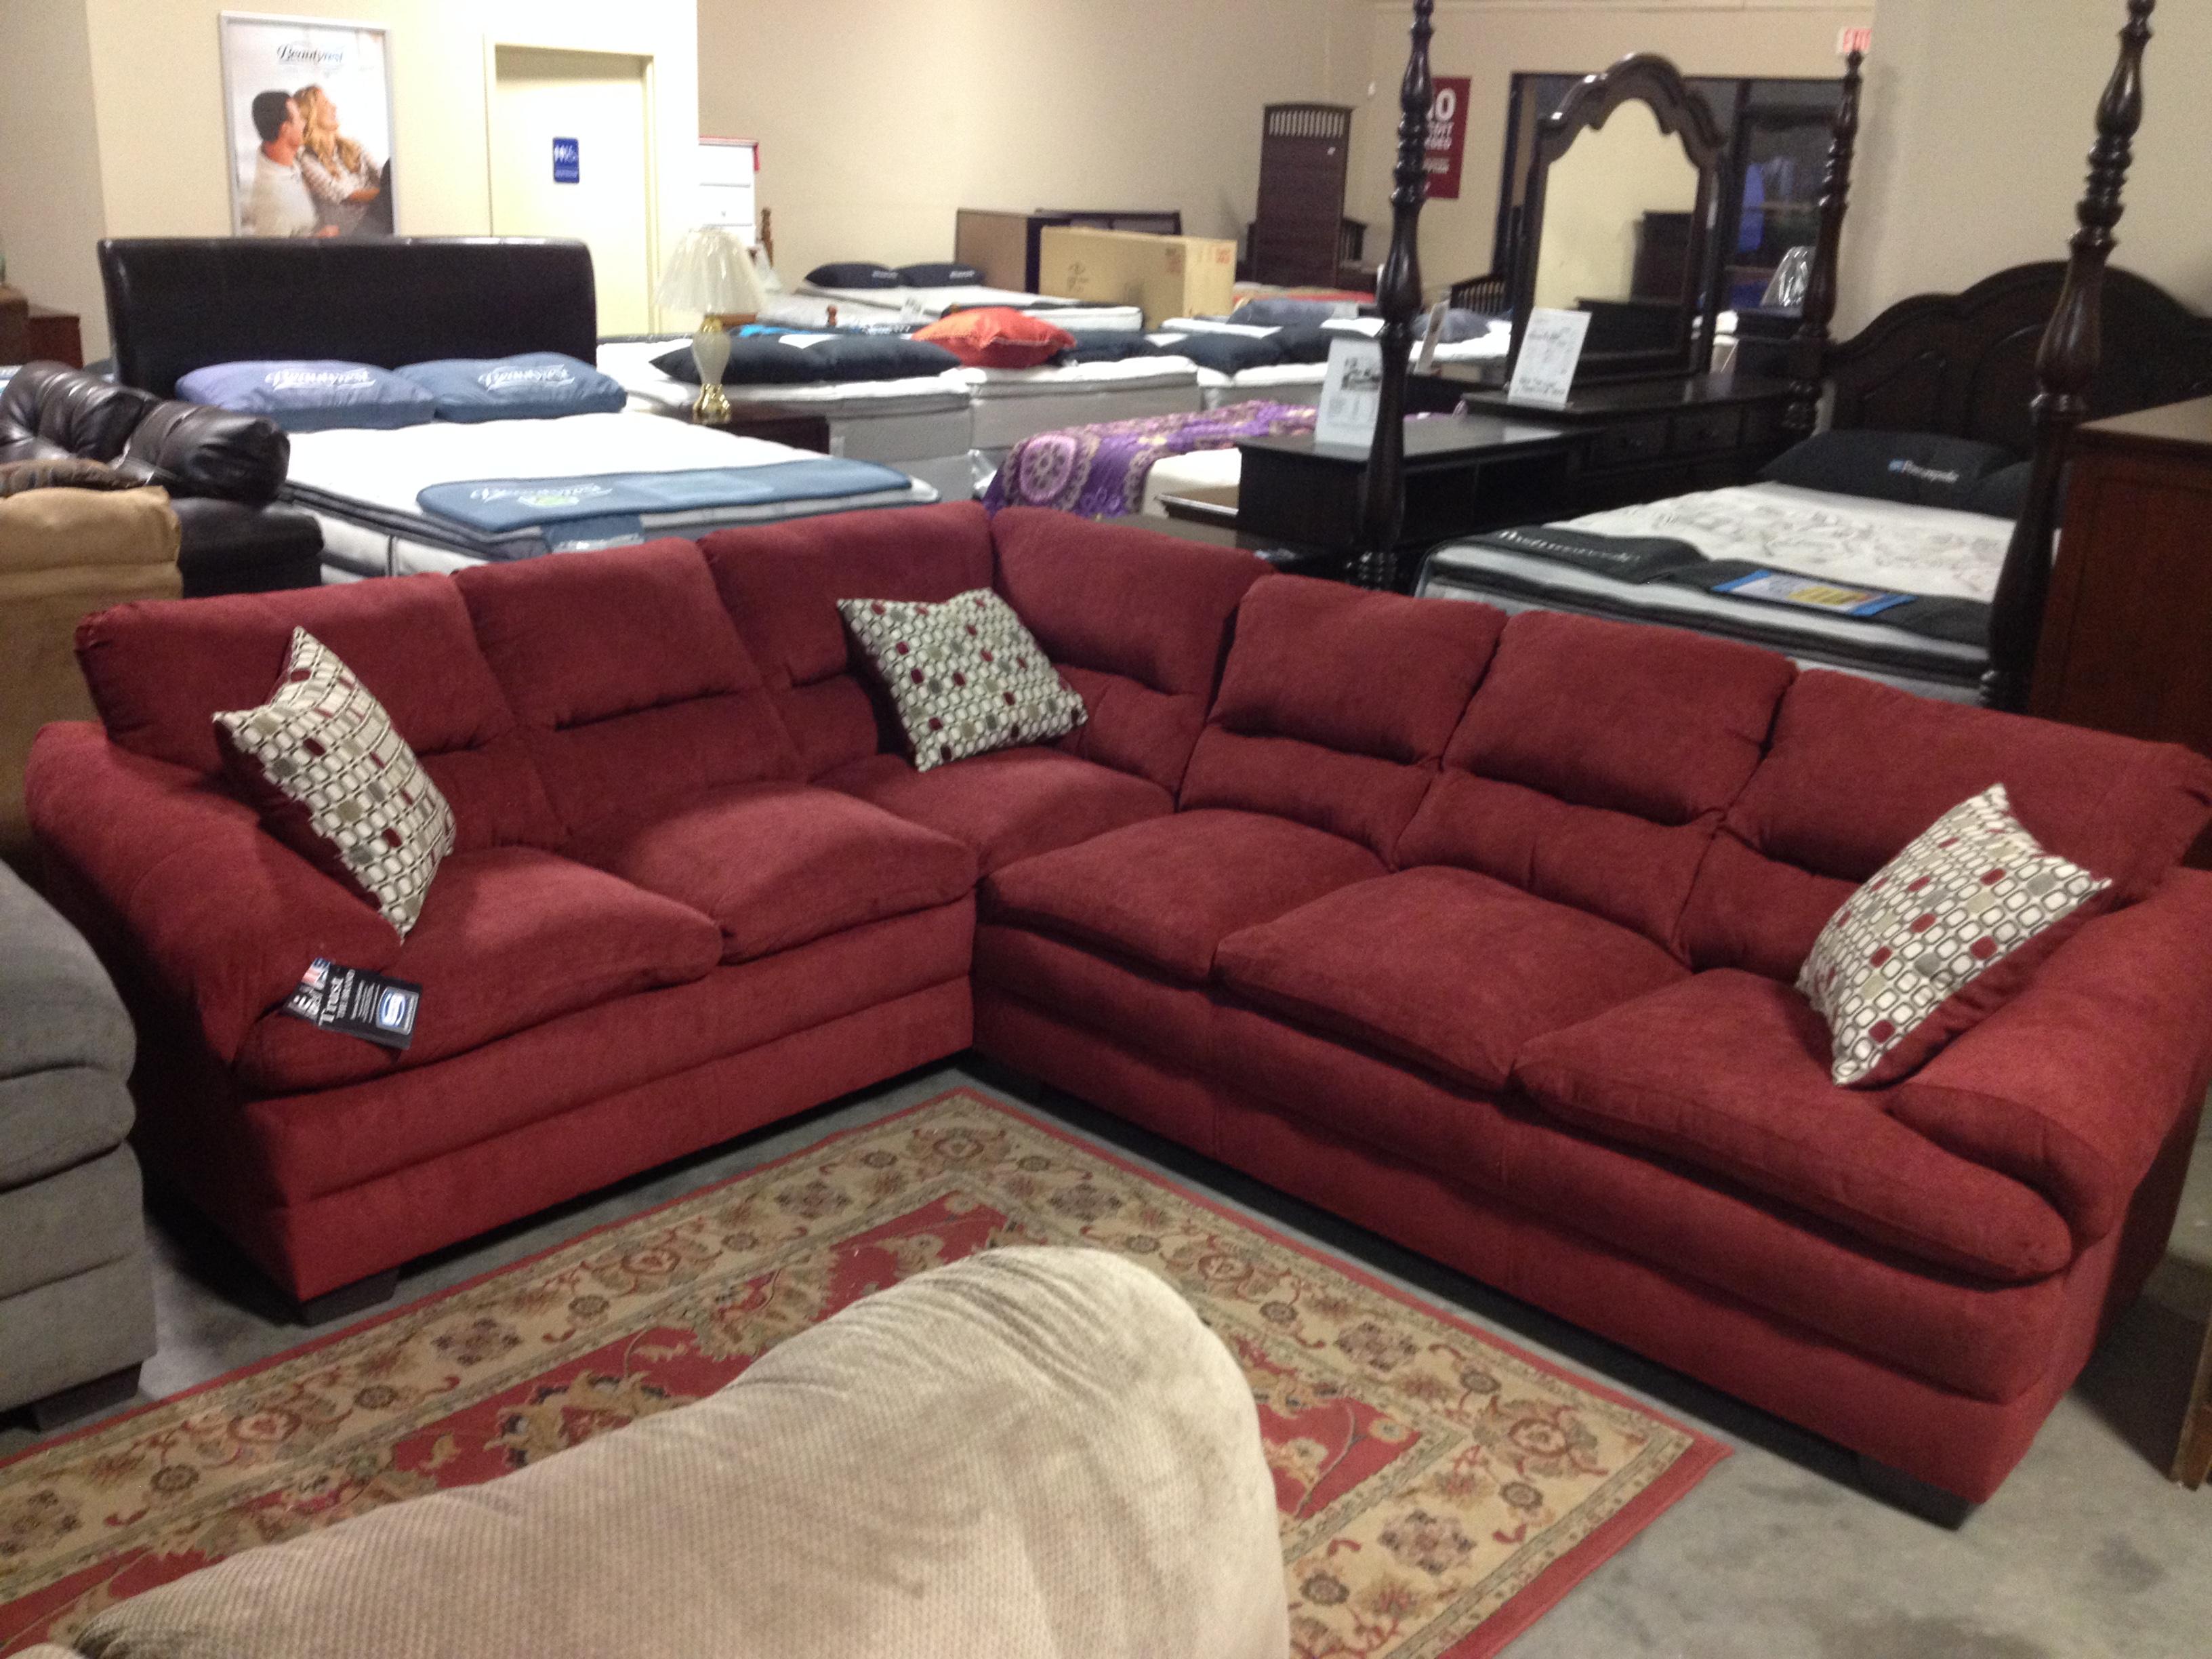 sofa liquidation sale score icu april 30  may 2 living room furniture inventory